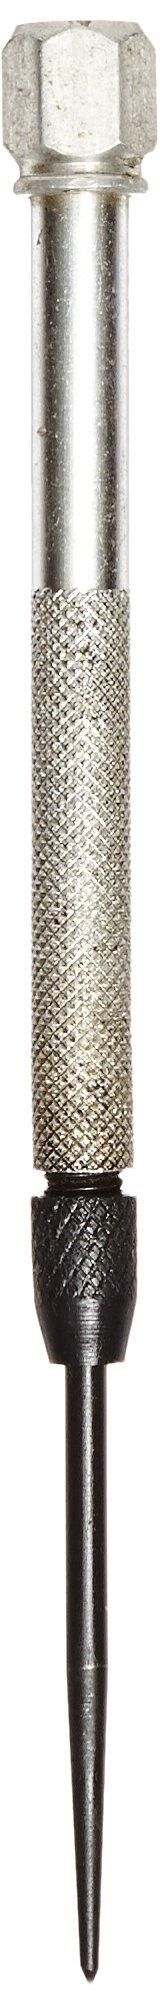 Fowler 52-515-005 Aluminum Knurled Steel Tubing Body Pocket Scriber, 5.625'' Length